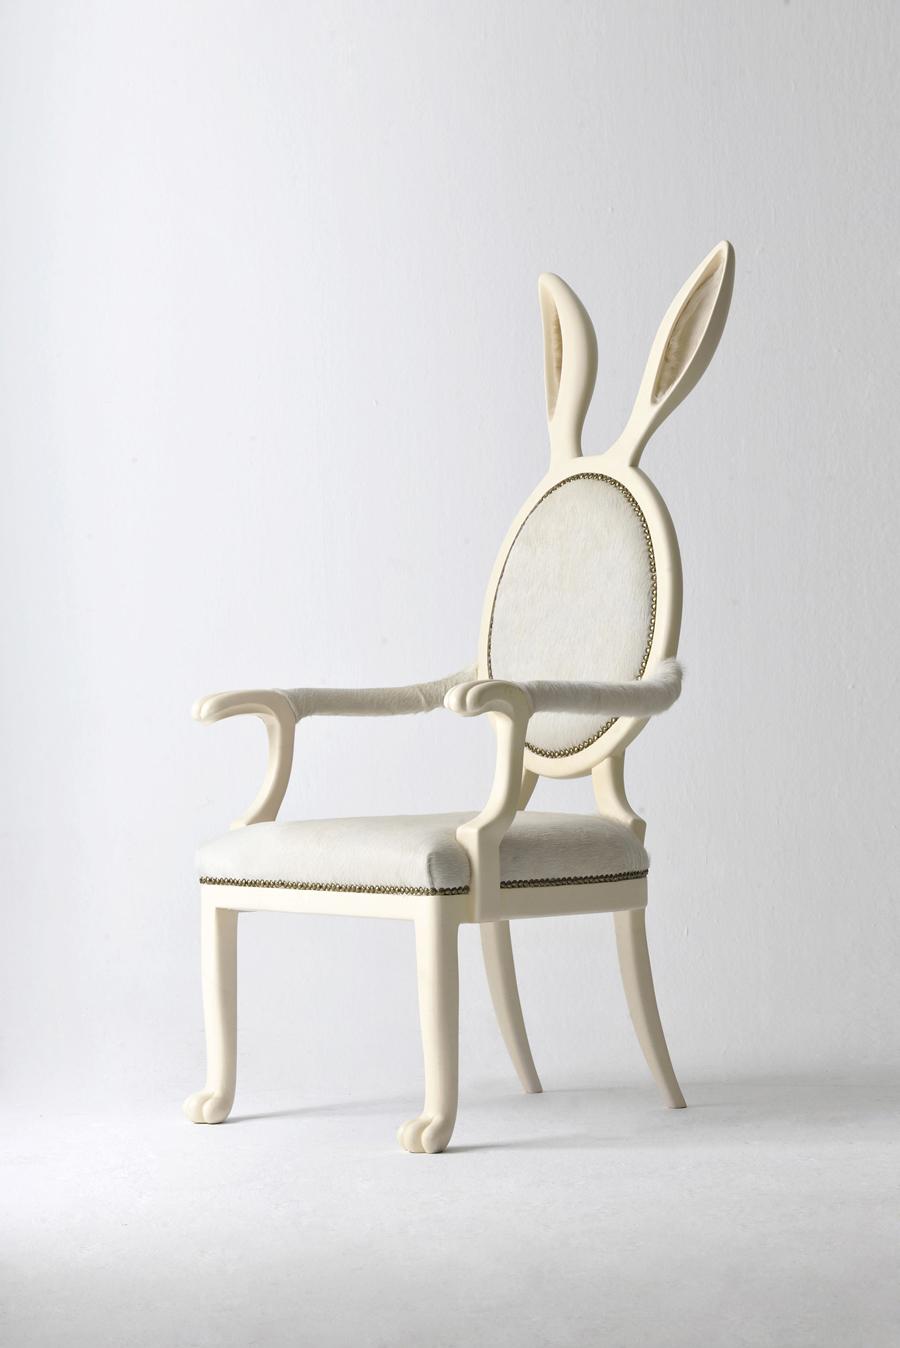 Easter Furniture: HYBRID №2 Chair by Merve Kahramen